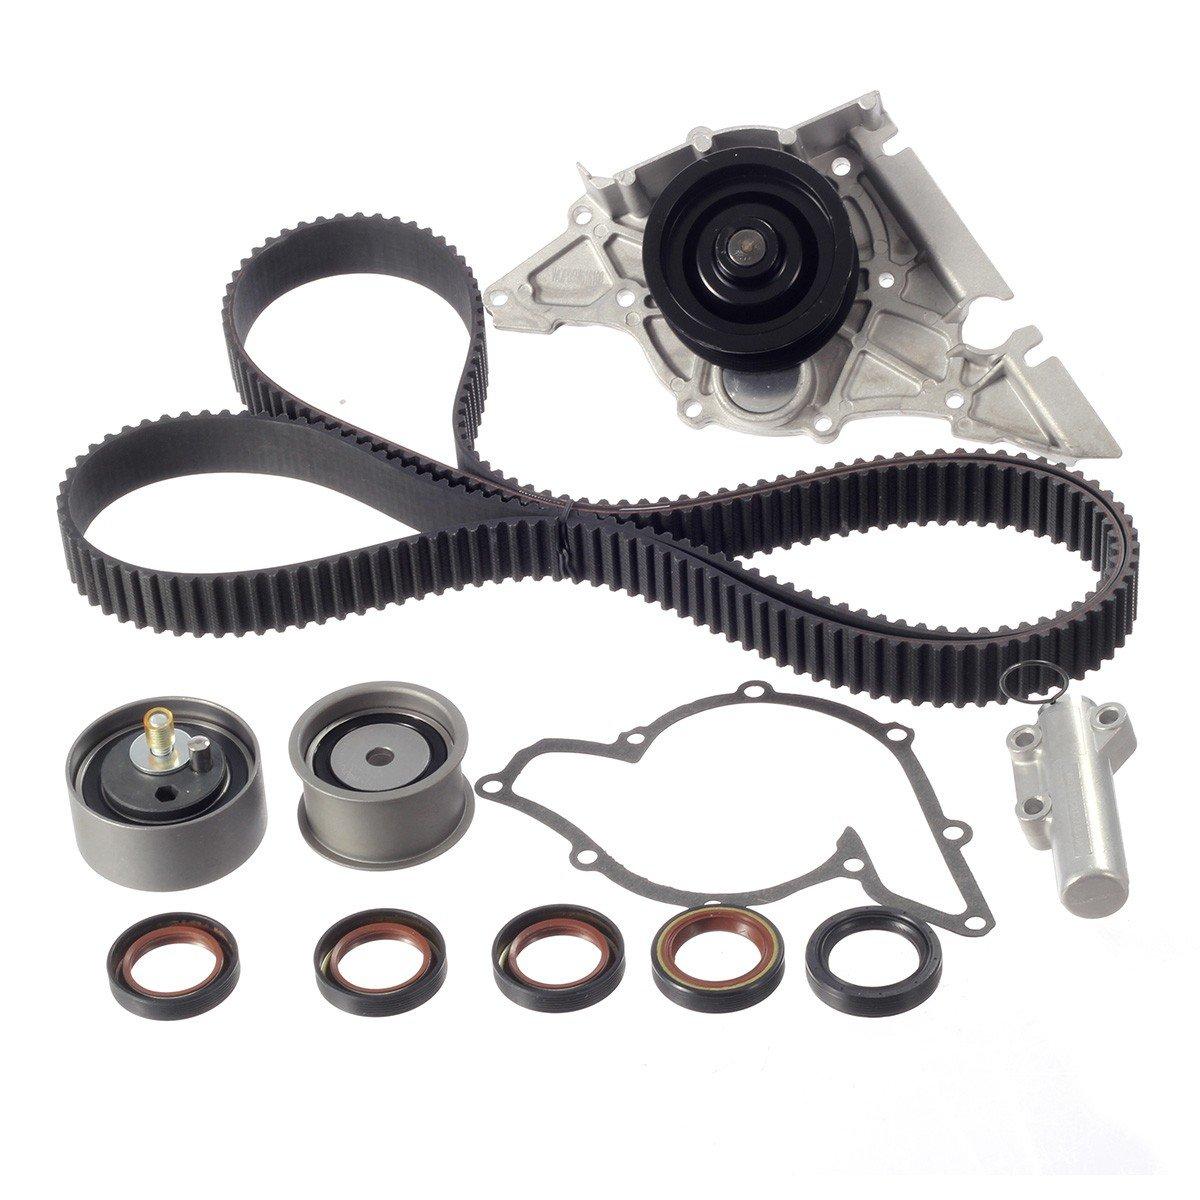 Timing Belt Water Pump Kit Tckwp297 Fits 1998 2001 Audi 1999 Isuzu Rodeo 2 A4 V6 28l 2005 Volkswagen Passat Automotive